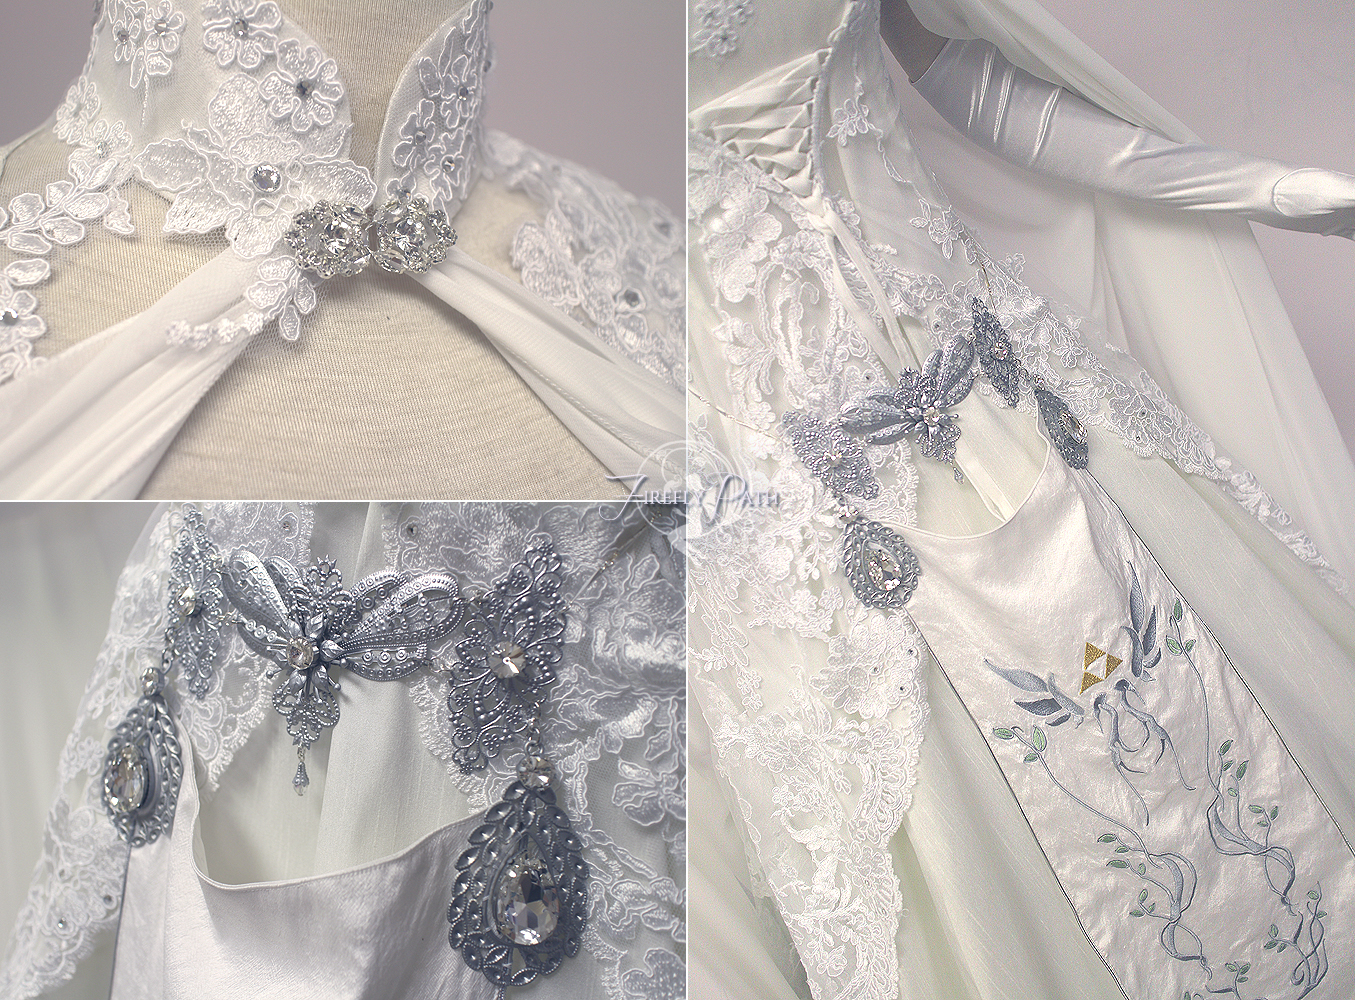 zelda wedding dress details by firefly path on deviantart With zelda wedding dress